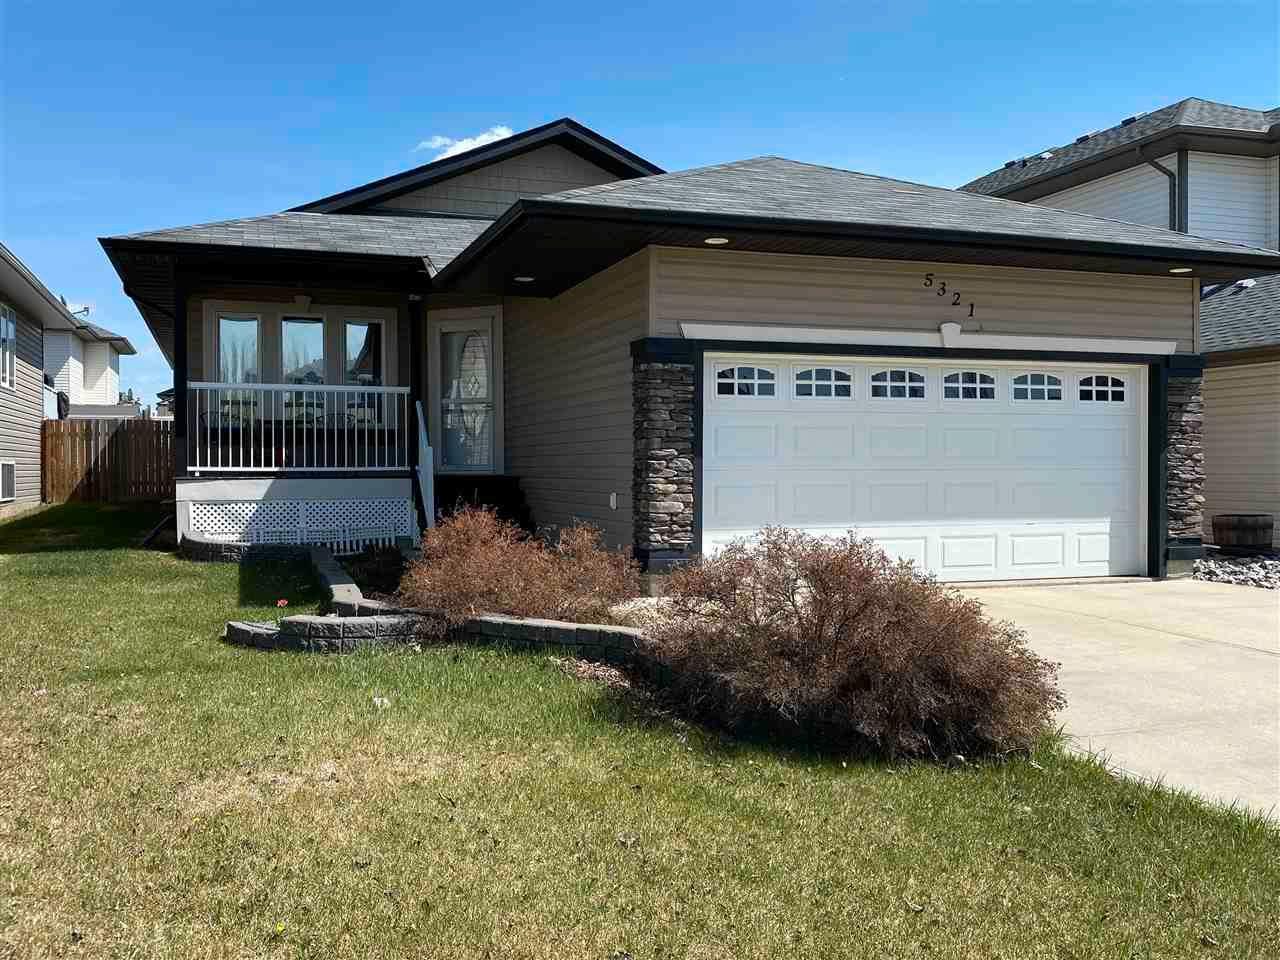 Main Photo: 5321 43 Street: Wetaskiwin House for sale : MLS®# E4233942